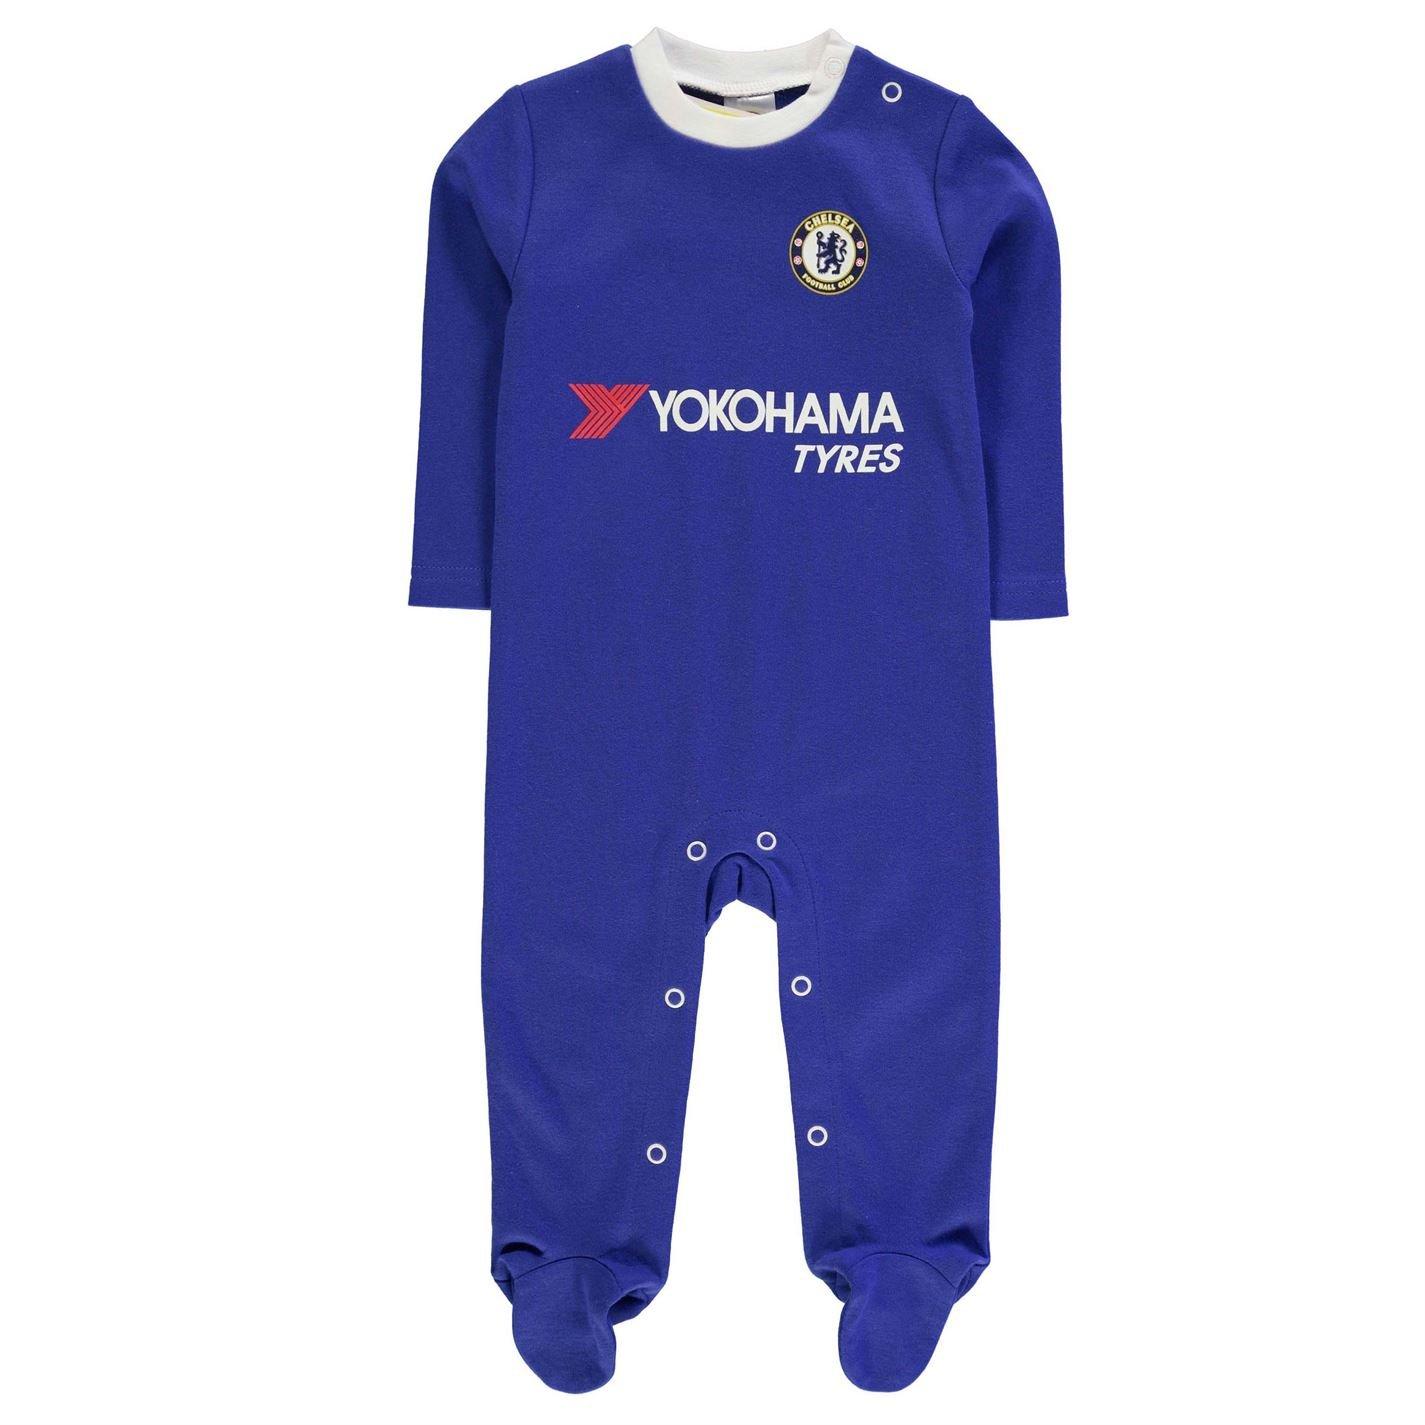 Team Kids Football Sleepsuit Baby Boys Cotton Long Sleeve Full Length Legs Top Chelsea 9-12 Mnth